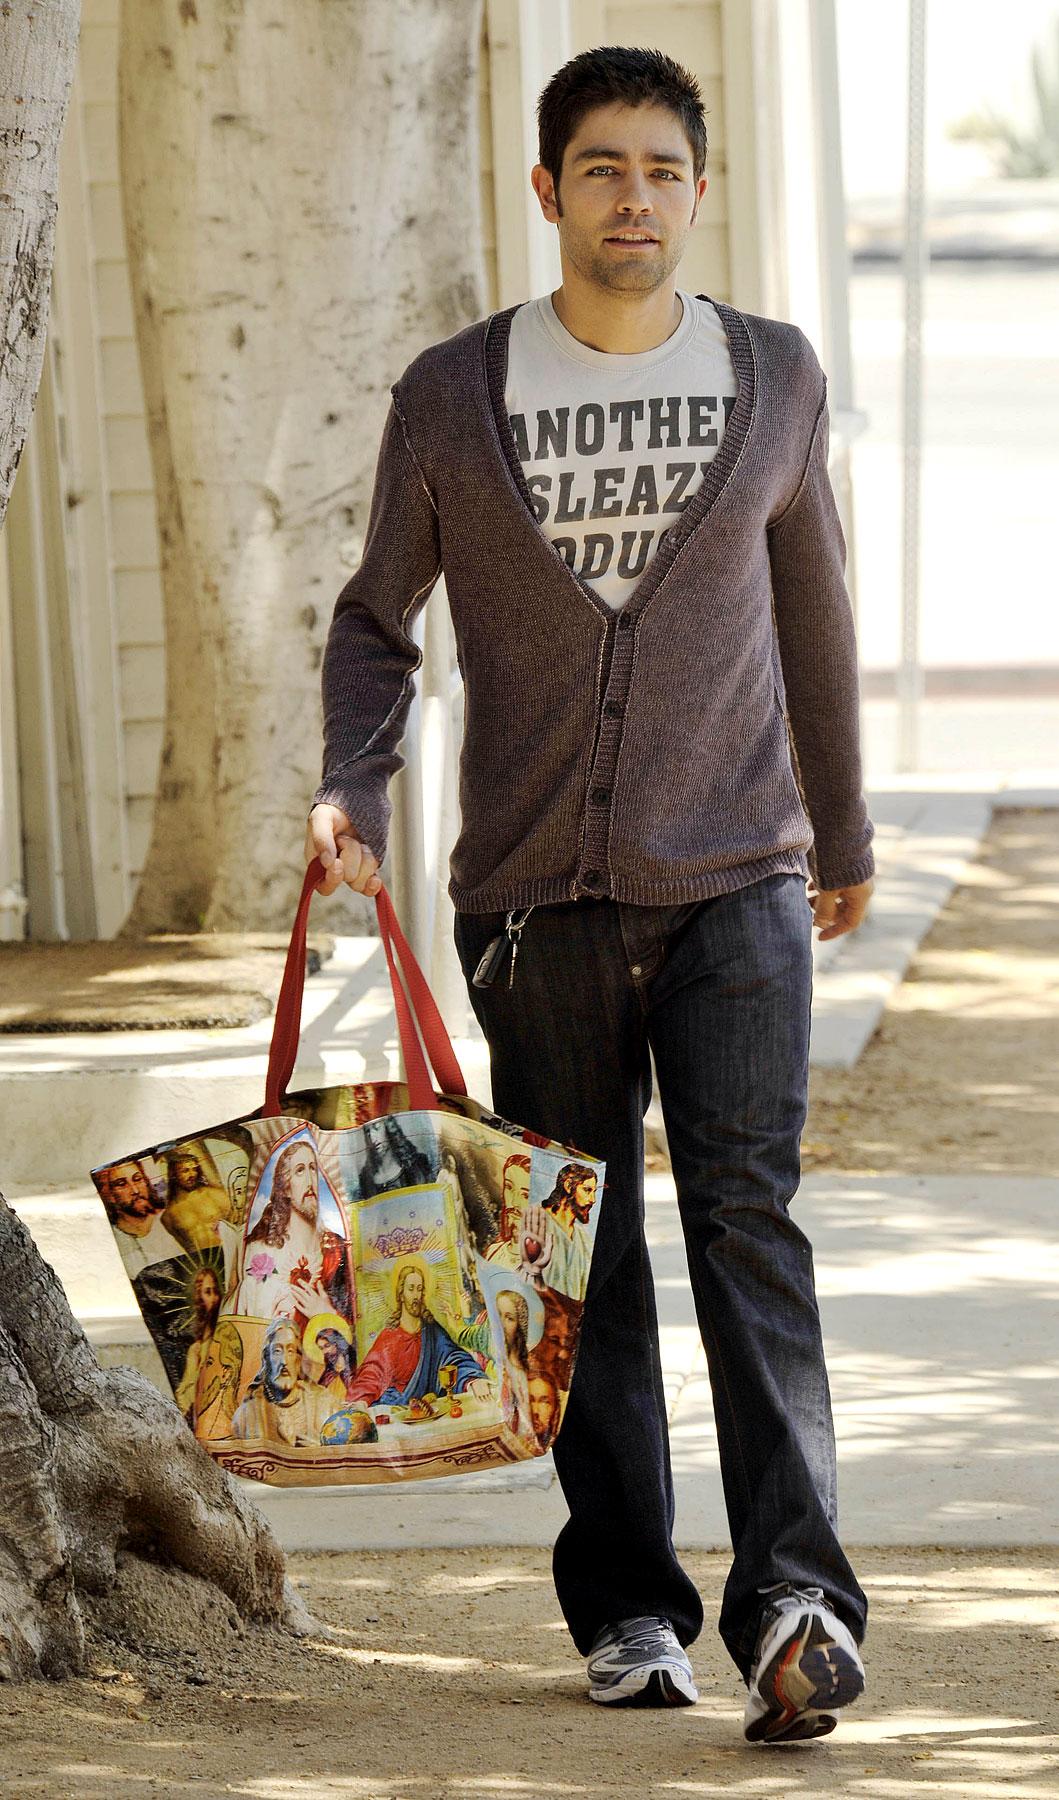 Adrian Grenier Carries A Bag, For Jesus (PHOTOS)